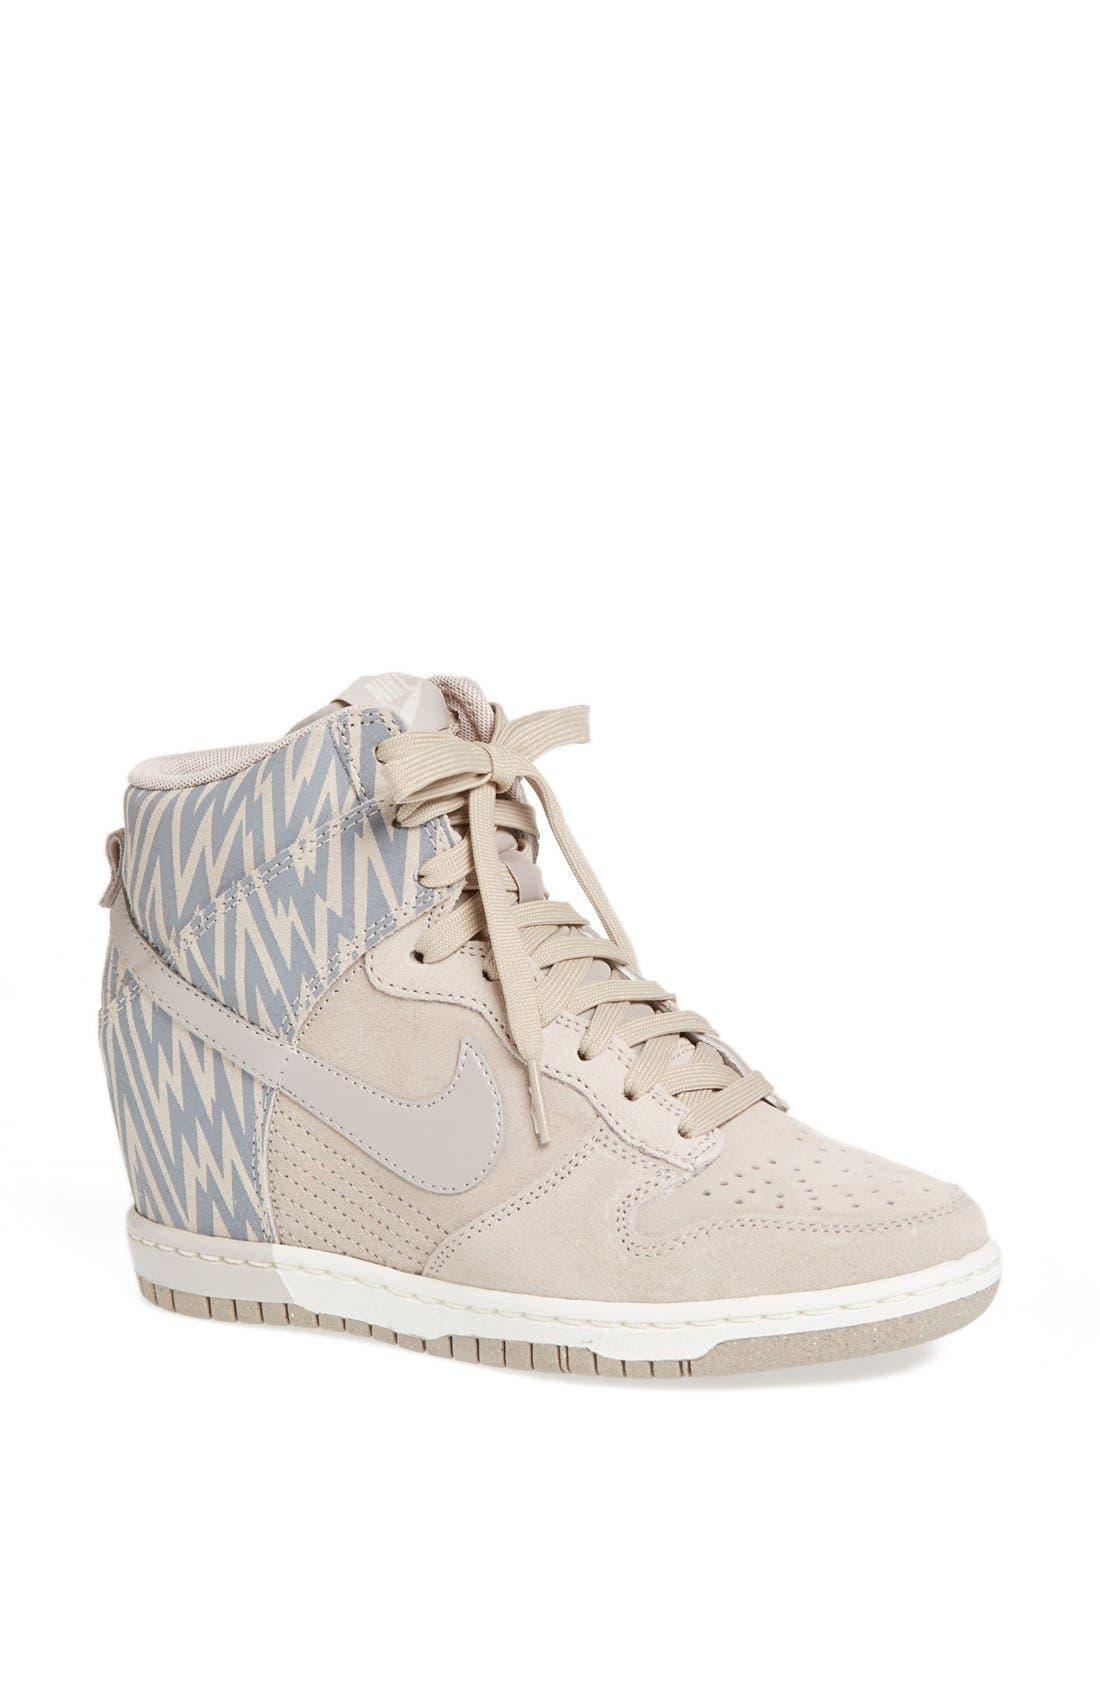 Main Image - Nike 'Dunk Sky Hi' Wedge Sneaker (Women)